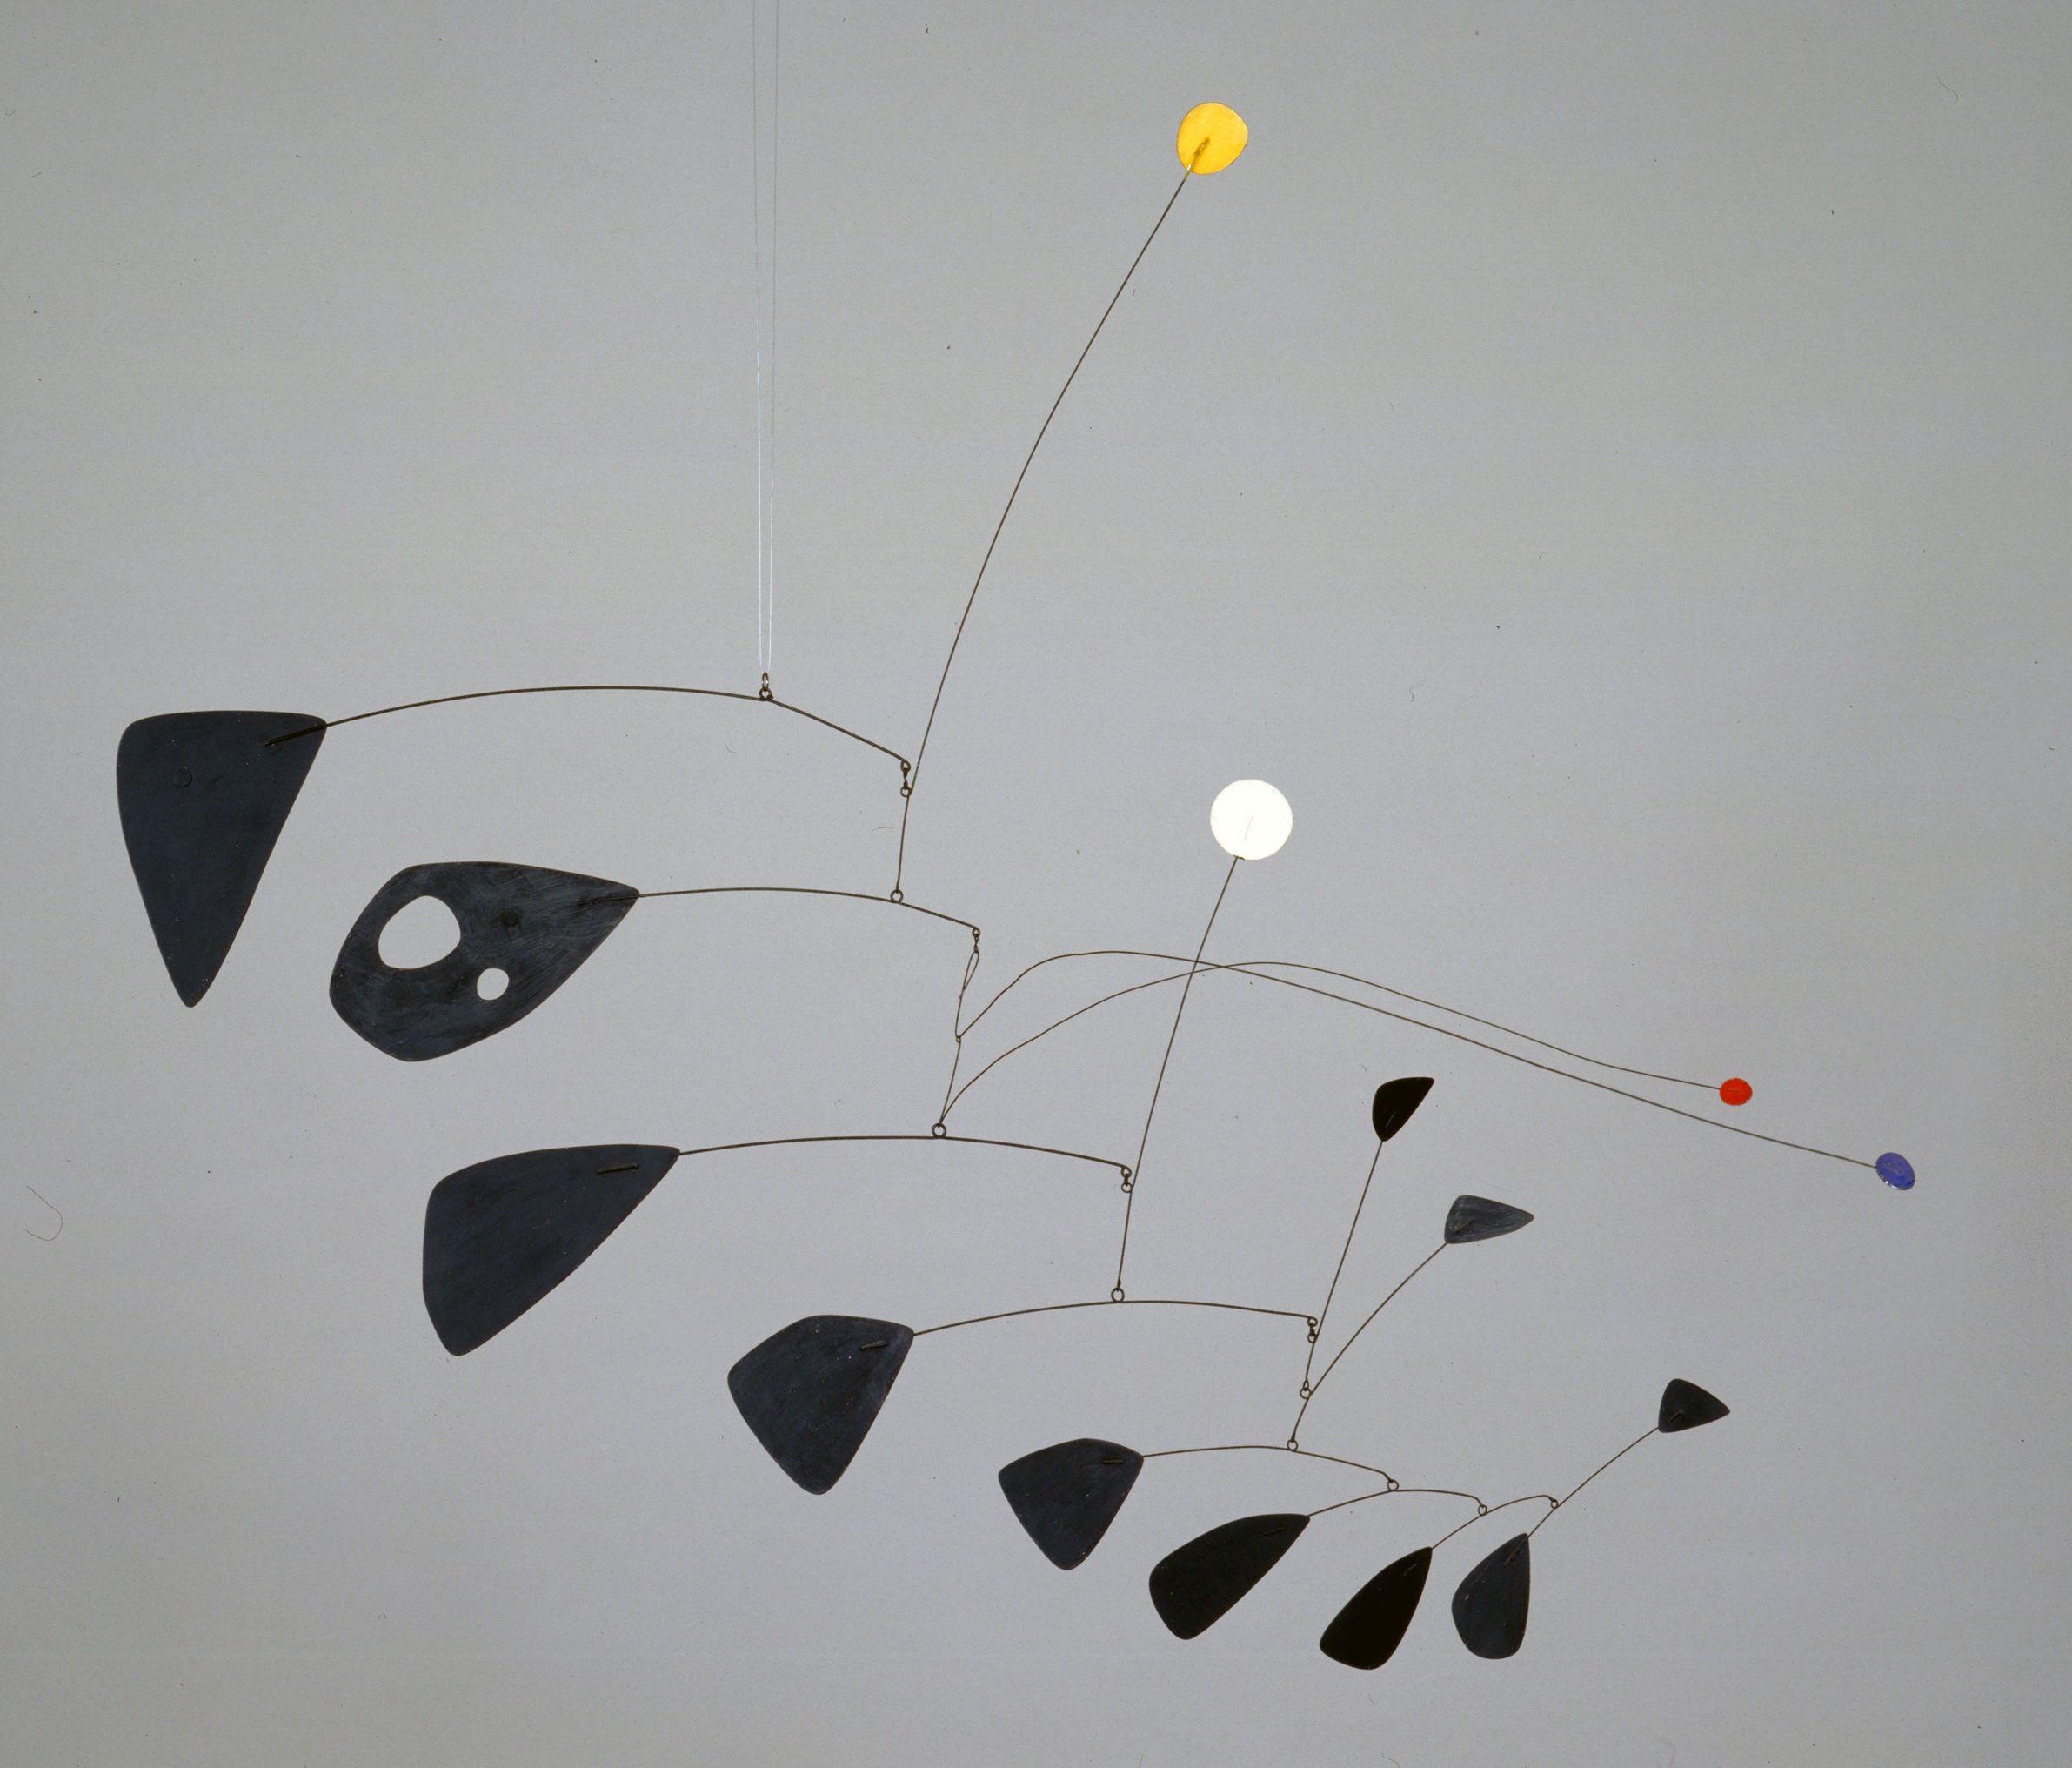 Tate Modern presents largest-ever UK exhibit of Calder works